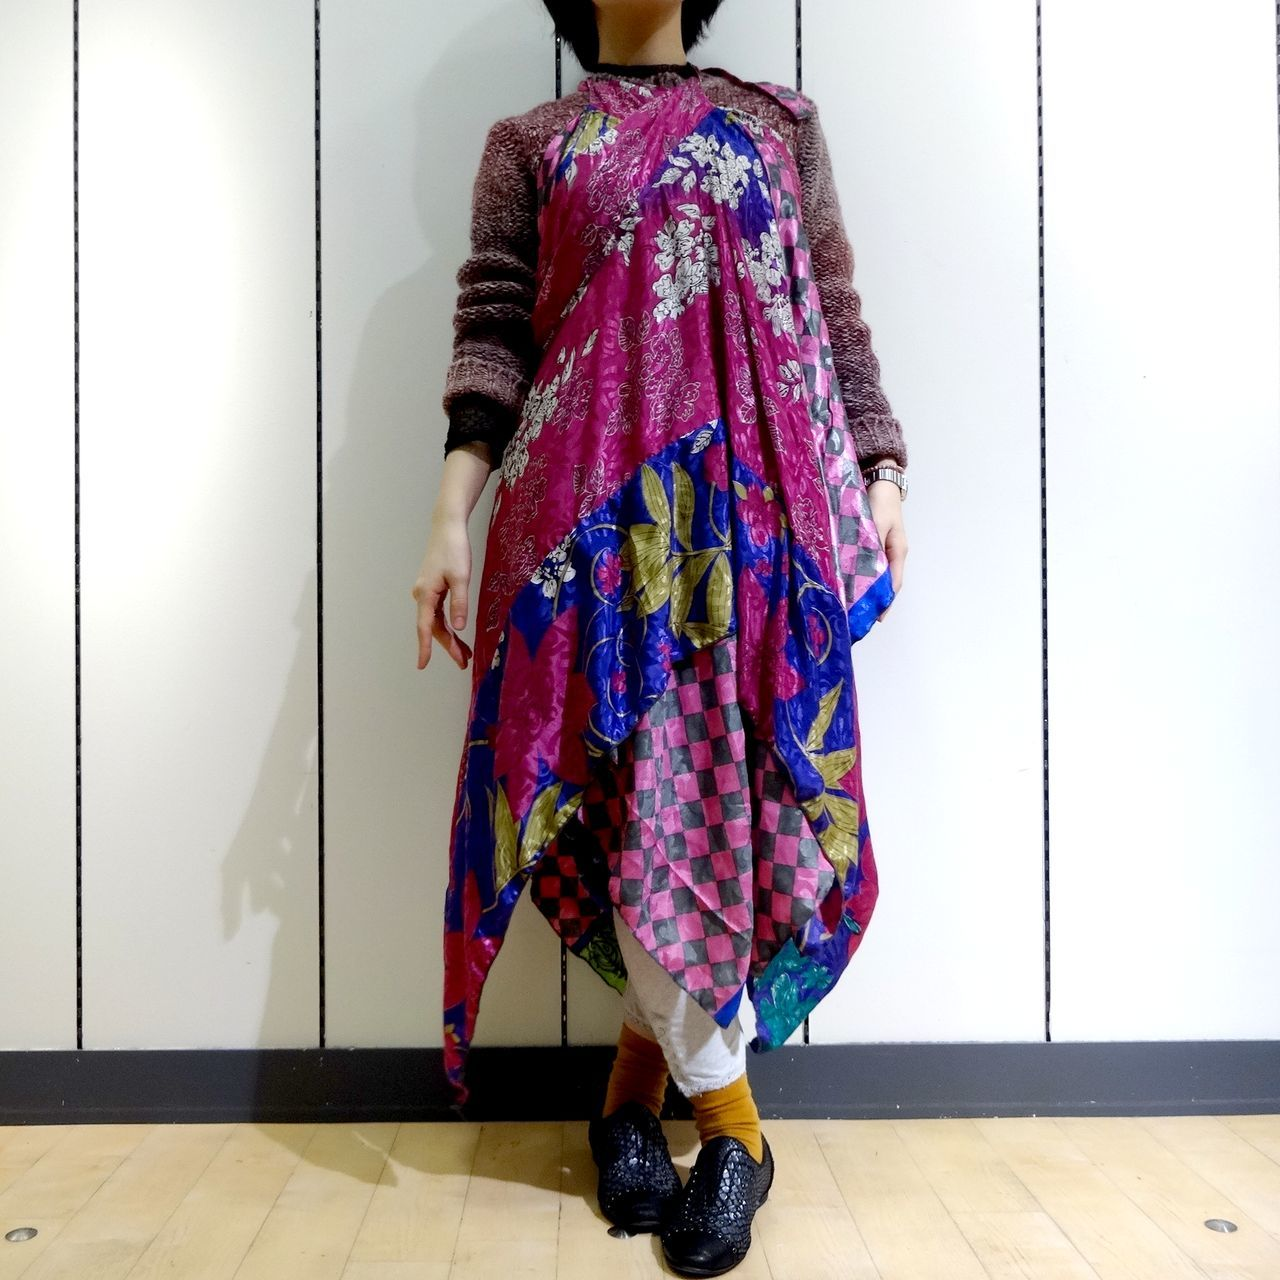 vdsz-001  ビンテージシルクサリーギザスカート「吉祥天女」